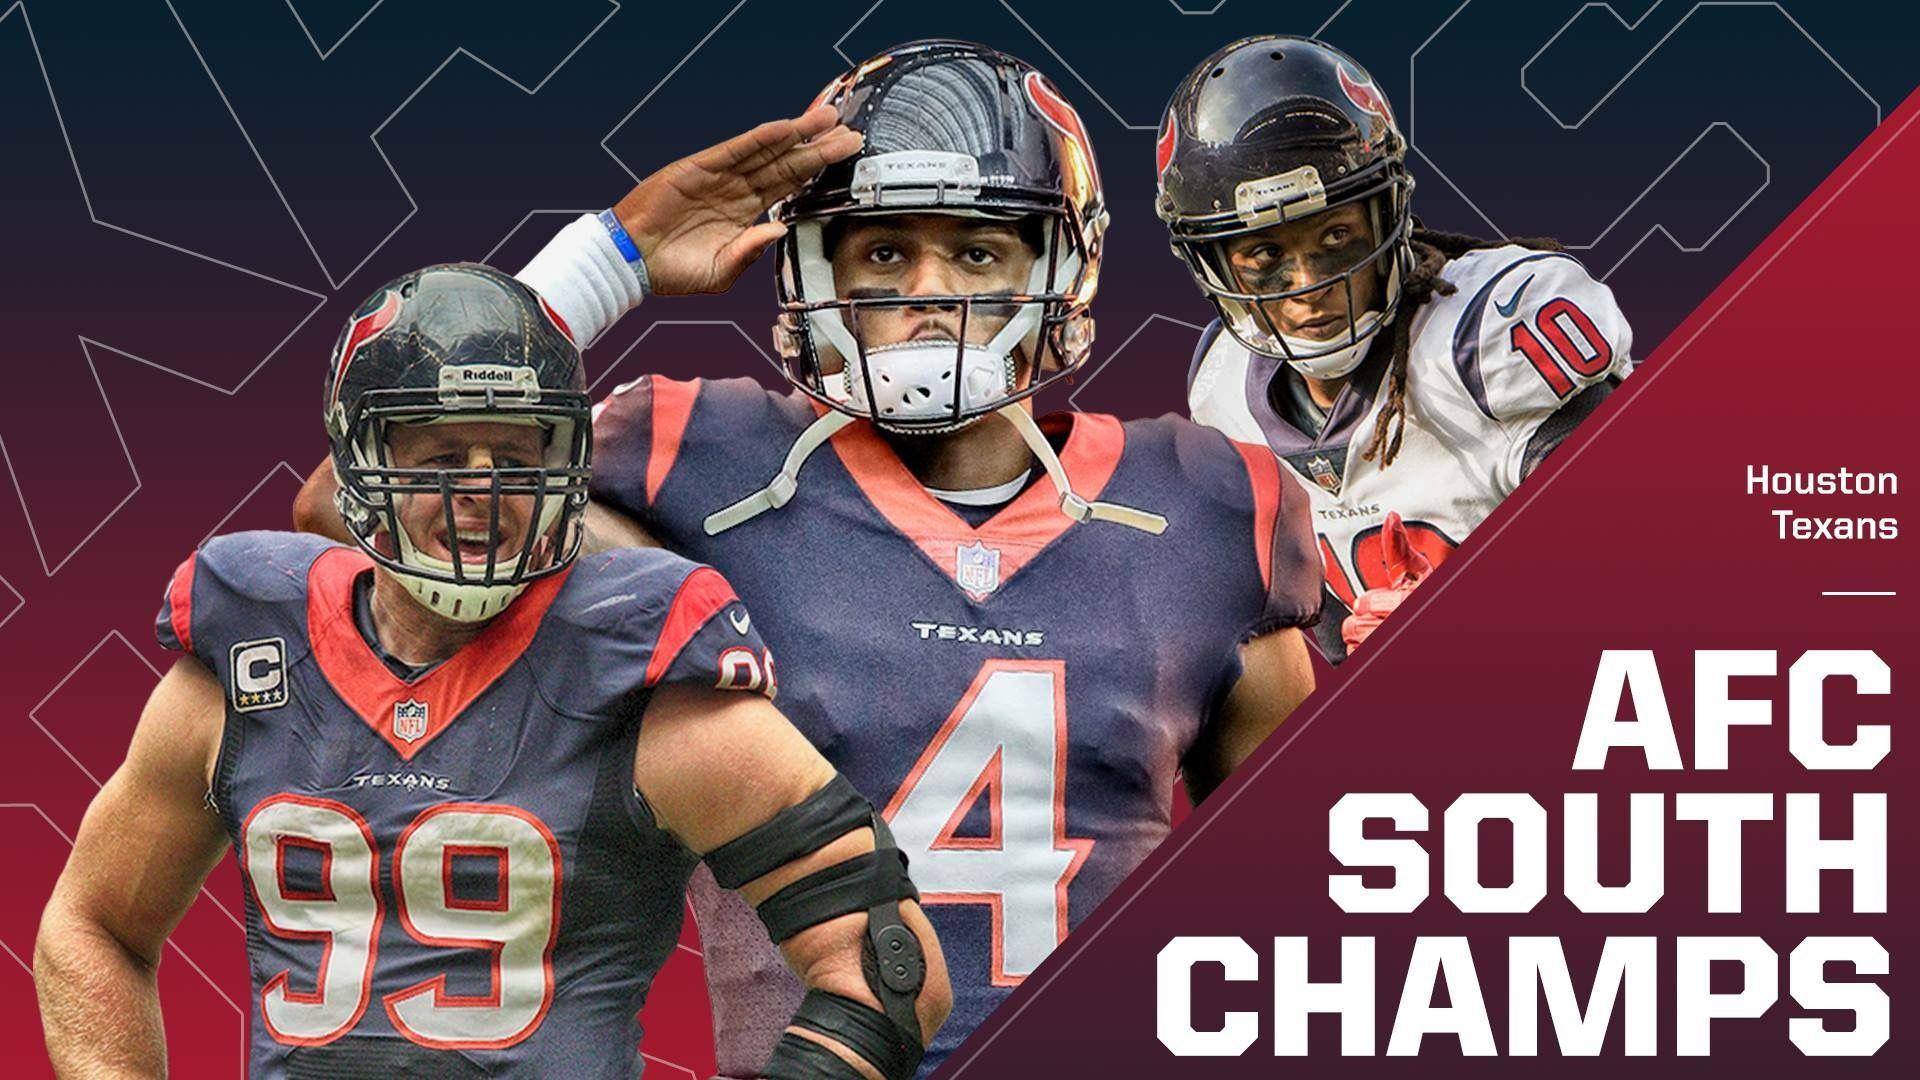 982f8d1a 2019 AFC South Champions | Houston Texans | Football helmets ...